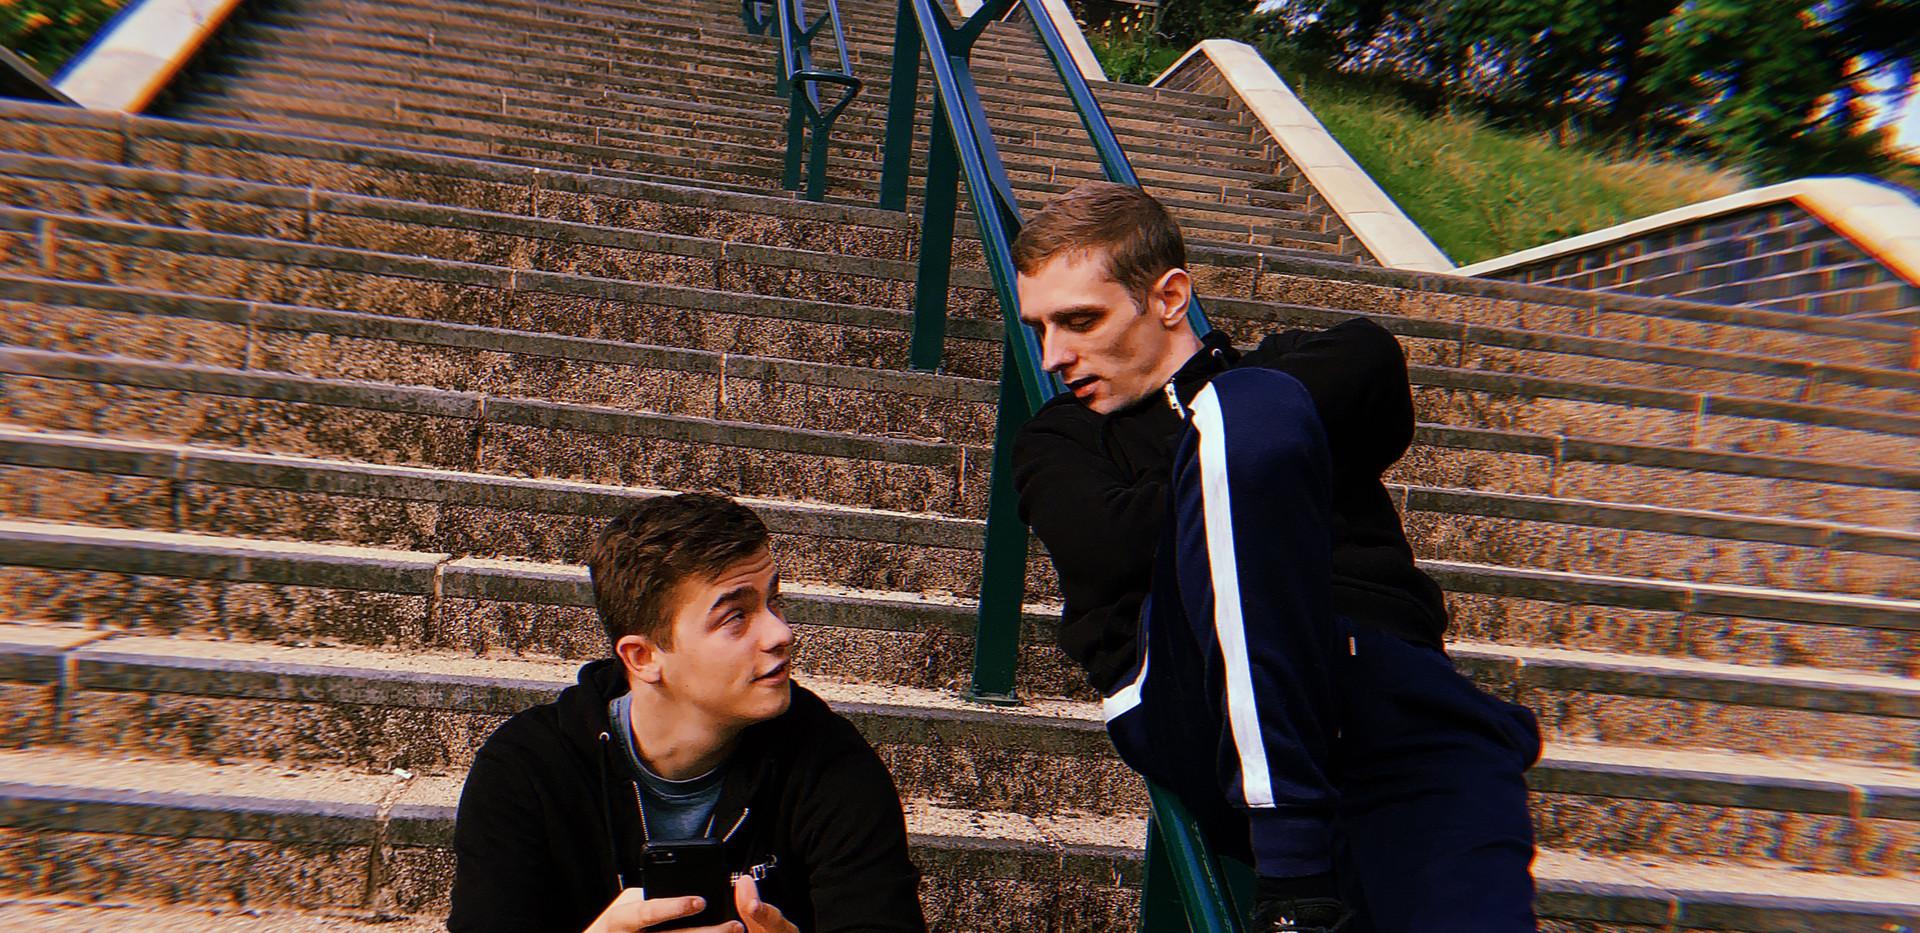 Noé & Jack filming material for the #GETHELP website